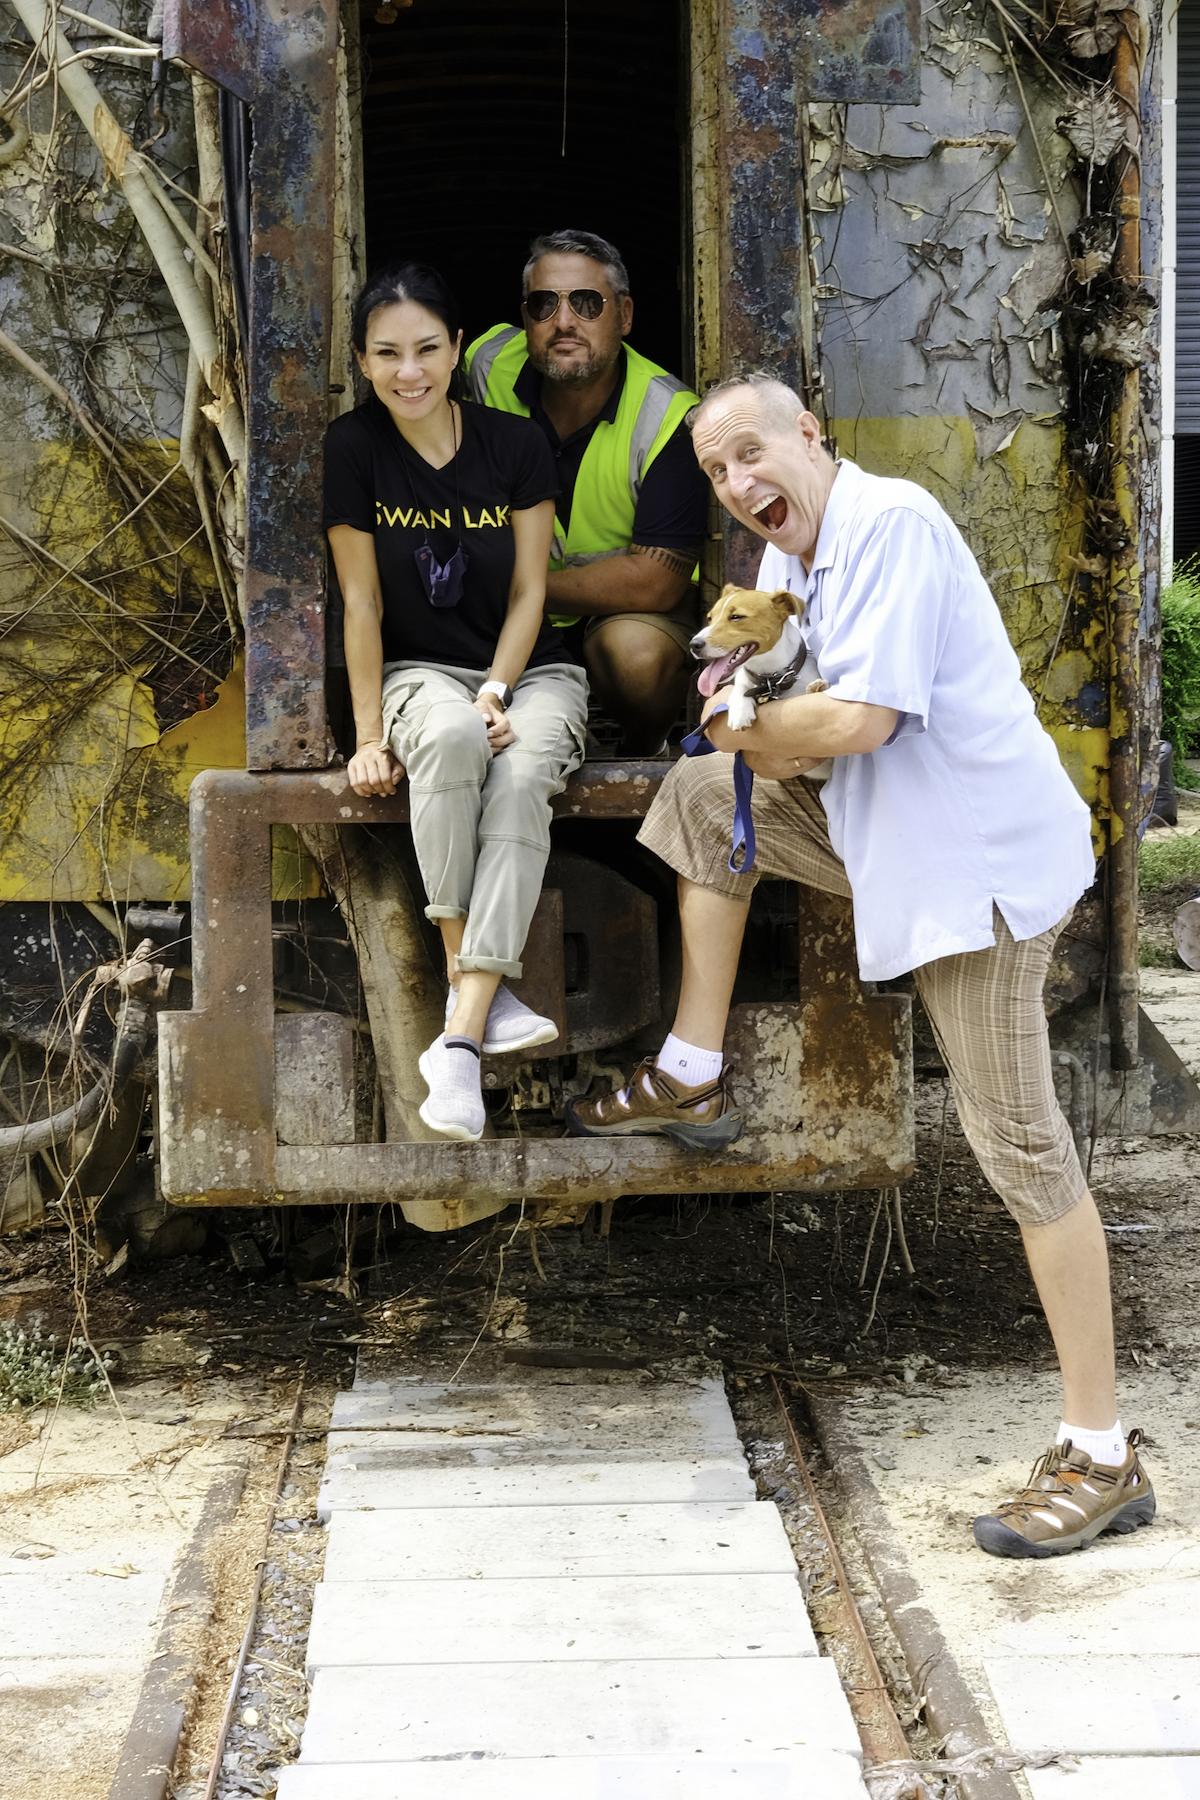 Bill Bensley train carriages hotel Thailand Khao Yai